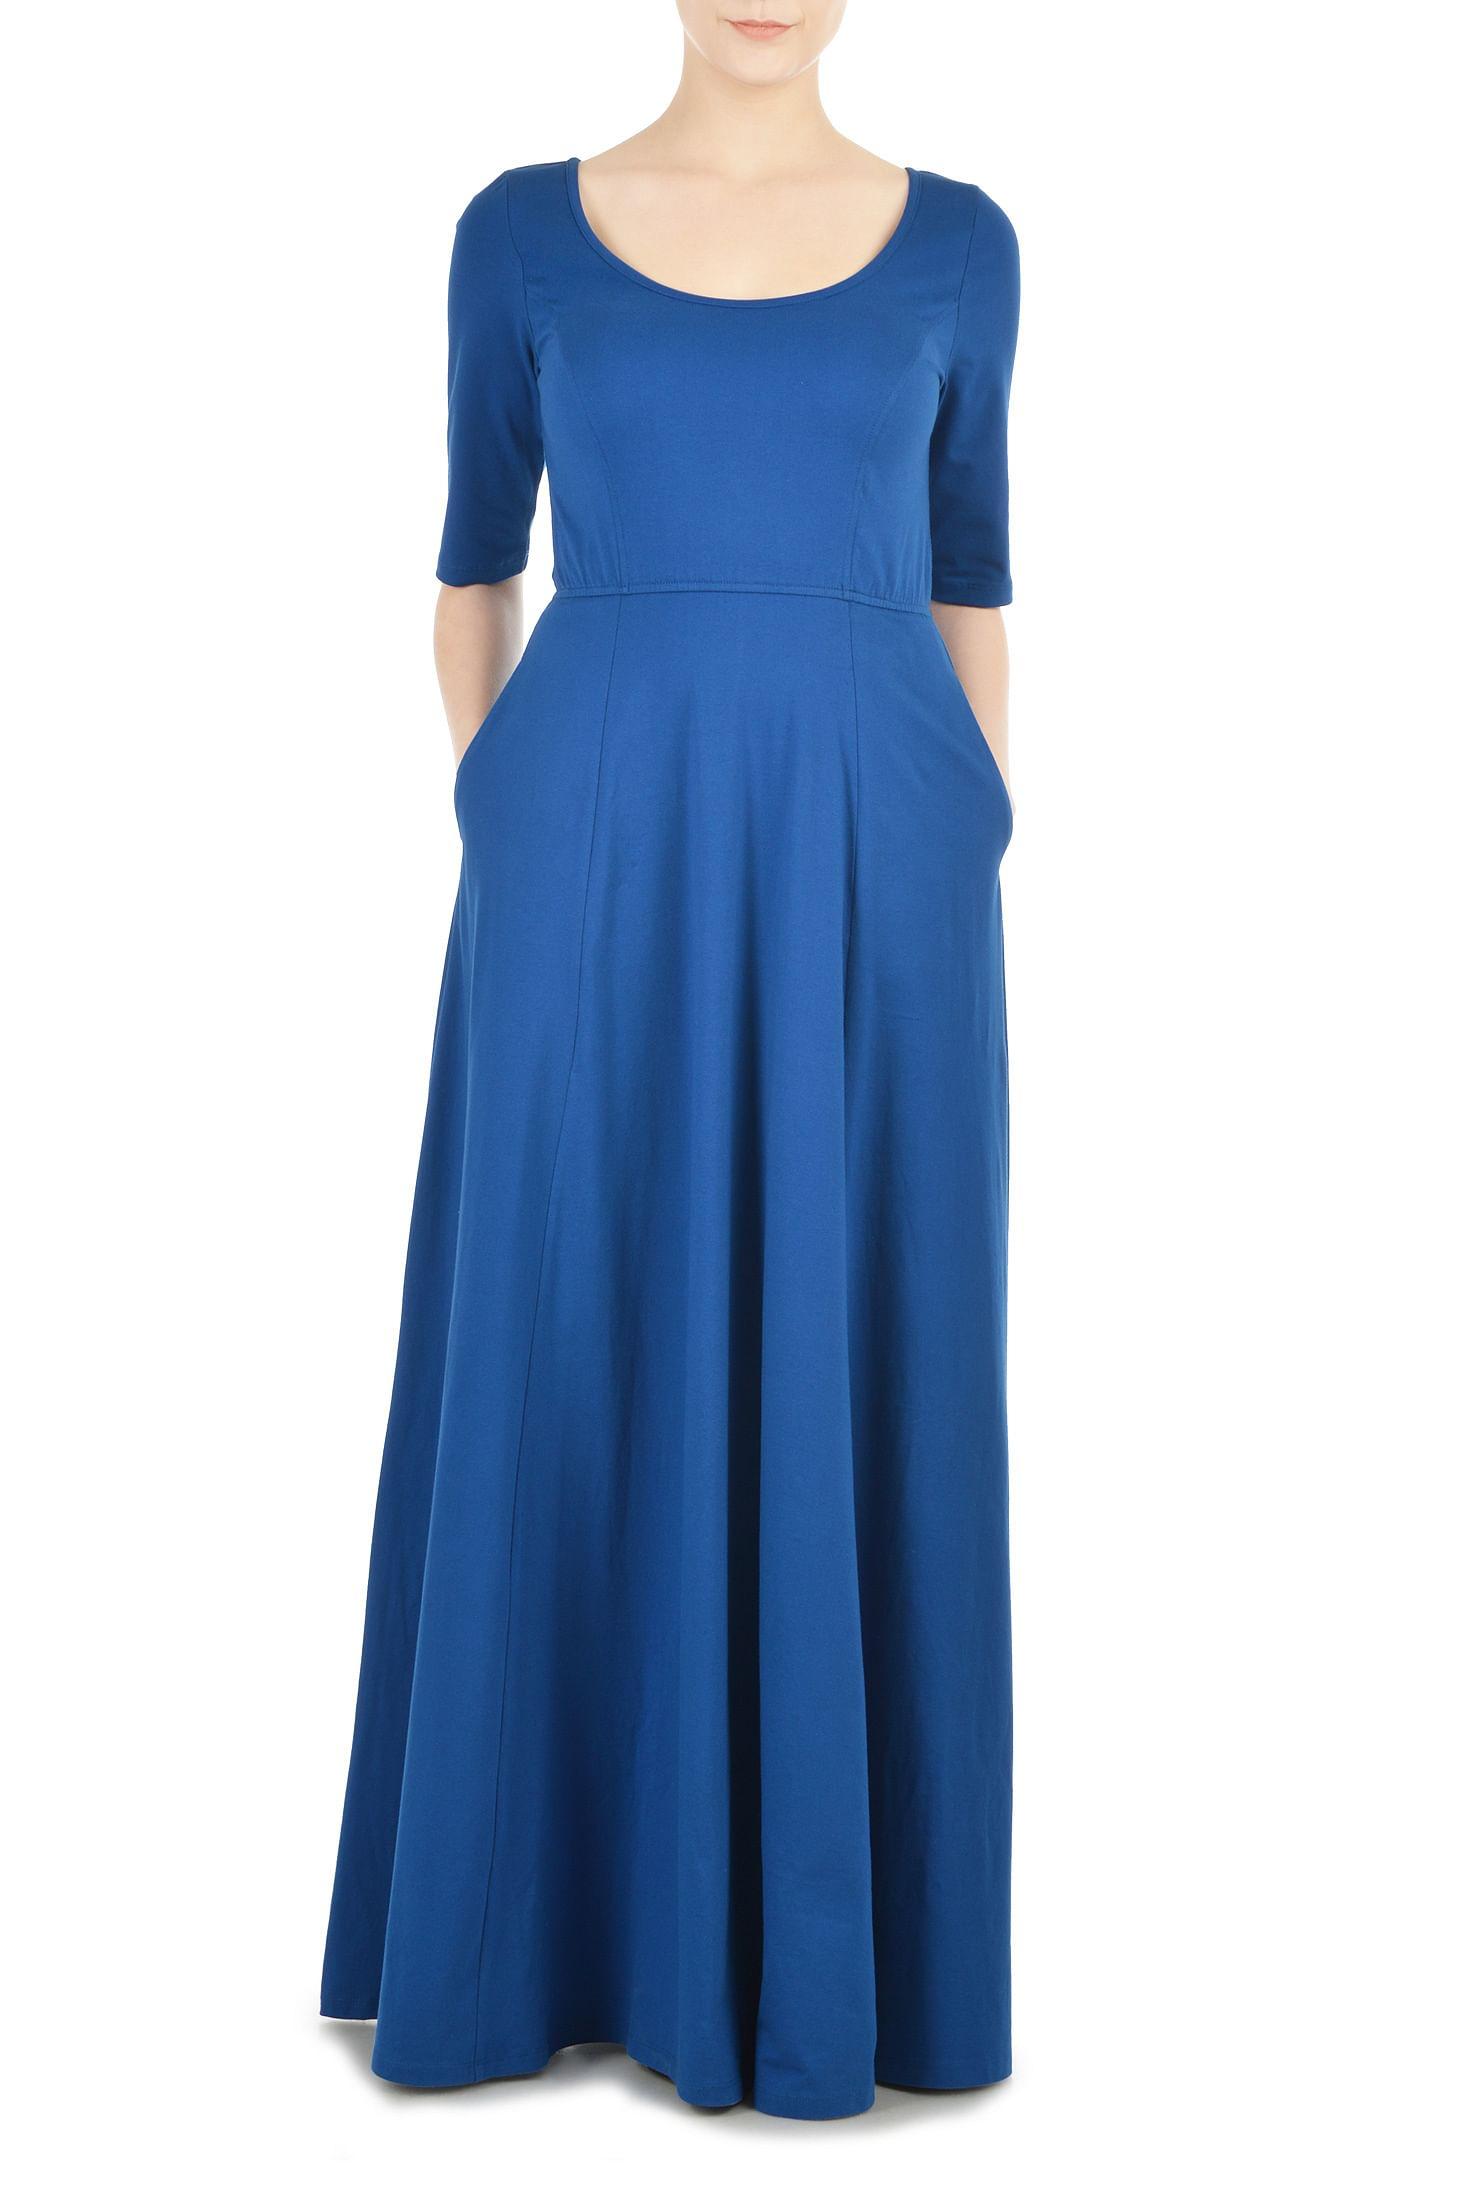 ddeb046b32f cotton/spandex Dresses, day dresses, elbow length sleeve dresses, Full  Length